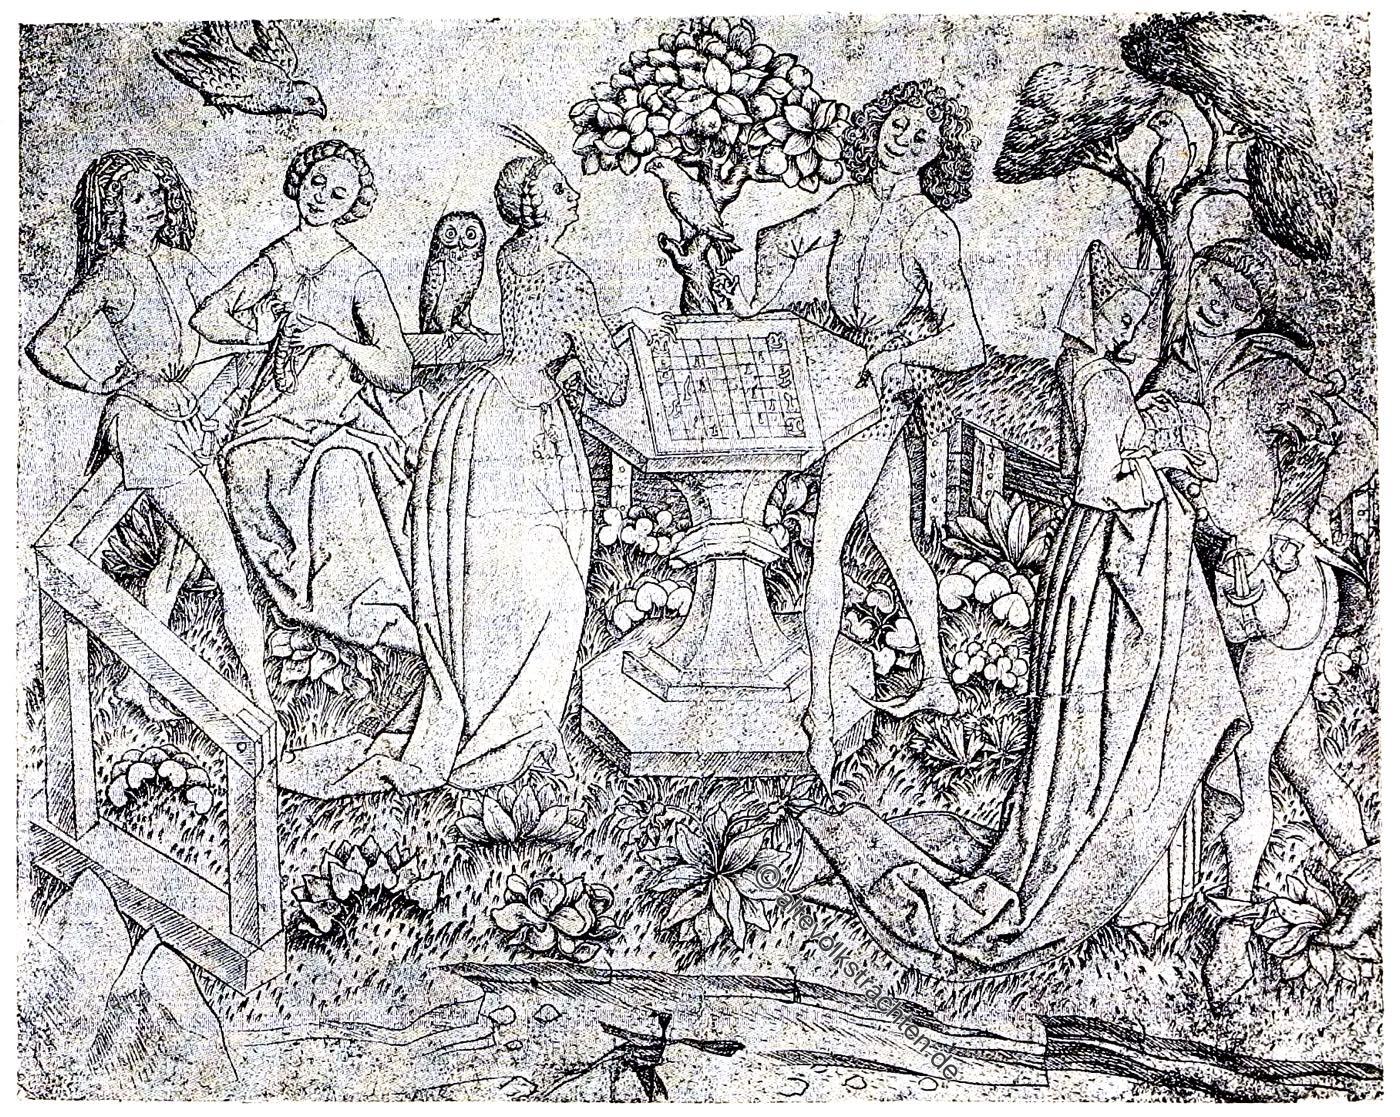 Maître de la Sibylle, Mittelalter, Gartenvergnügen, Gartenanlage